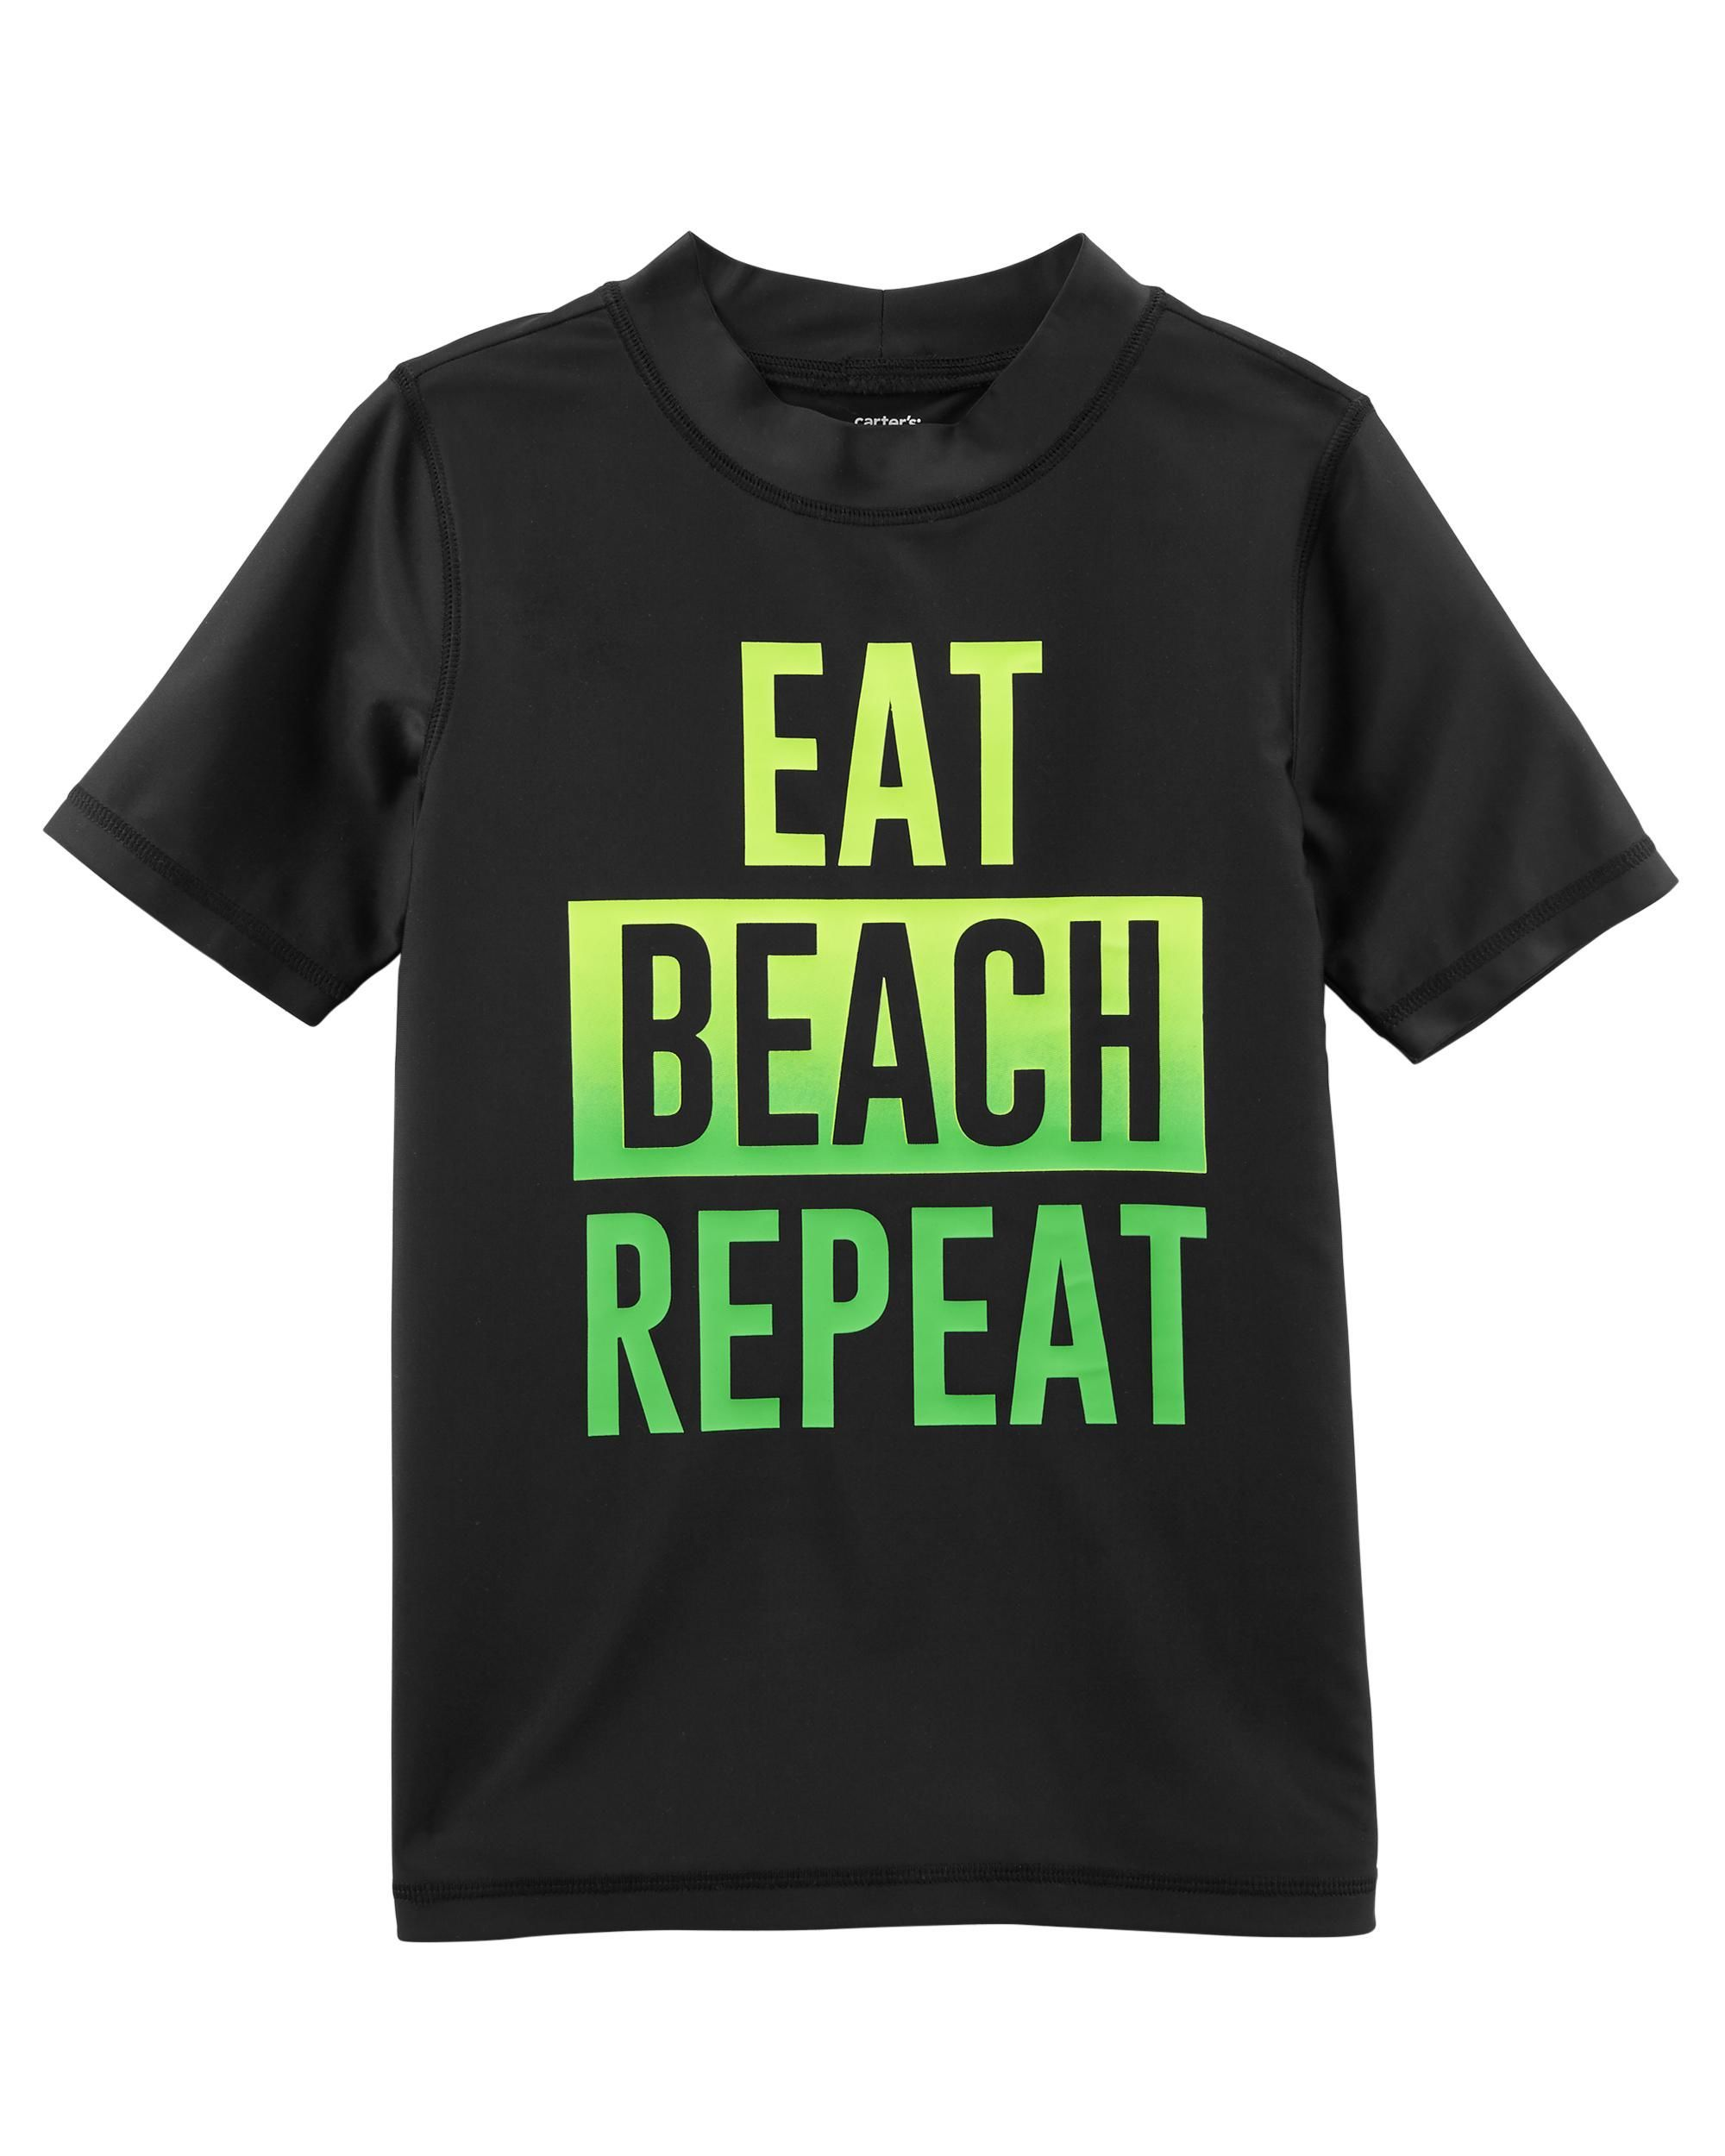 Carter's Beach Rashguard (With Images)